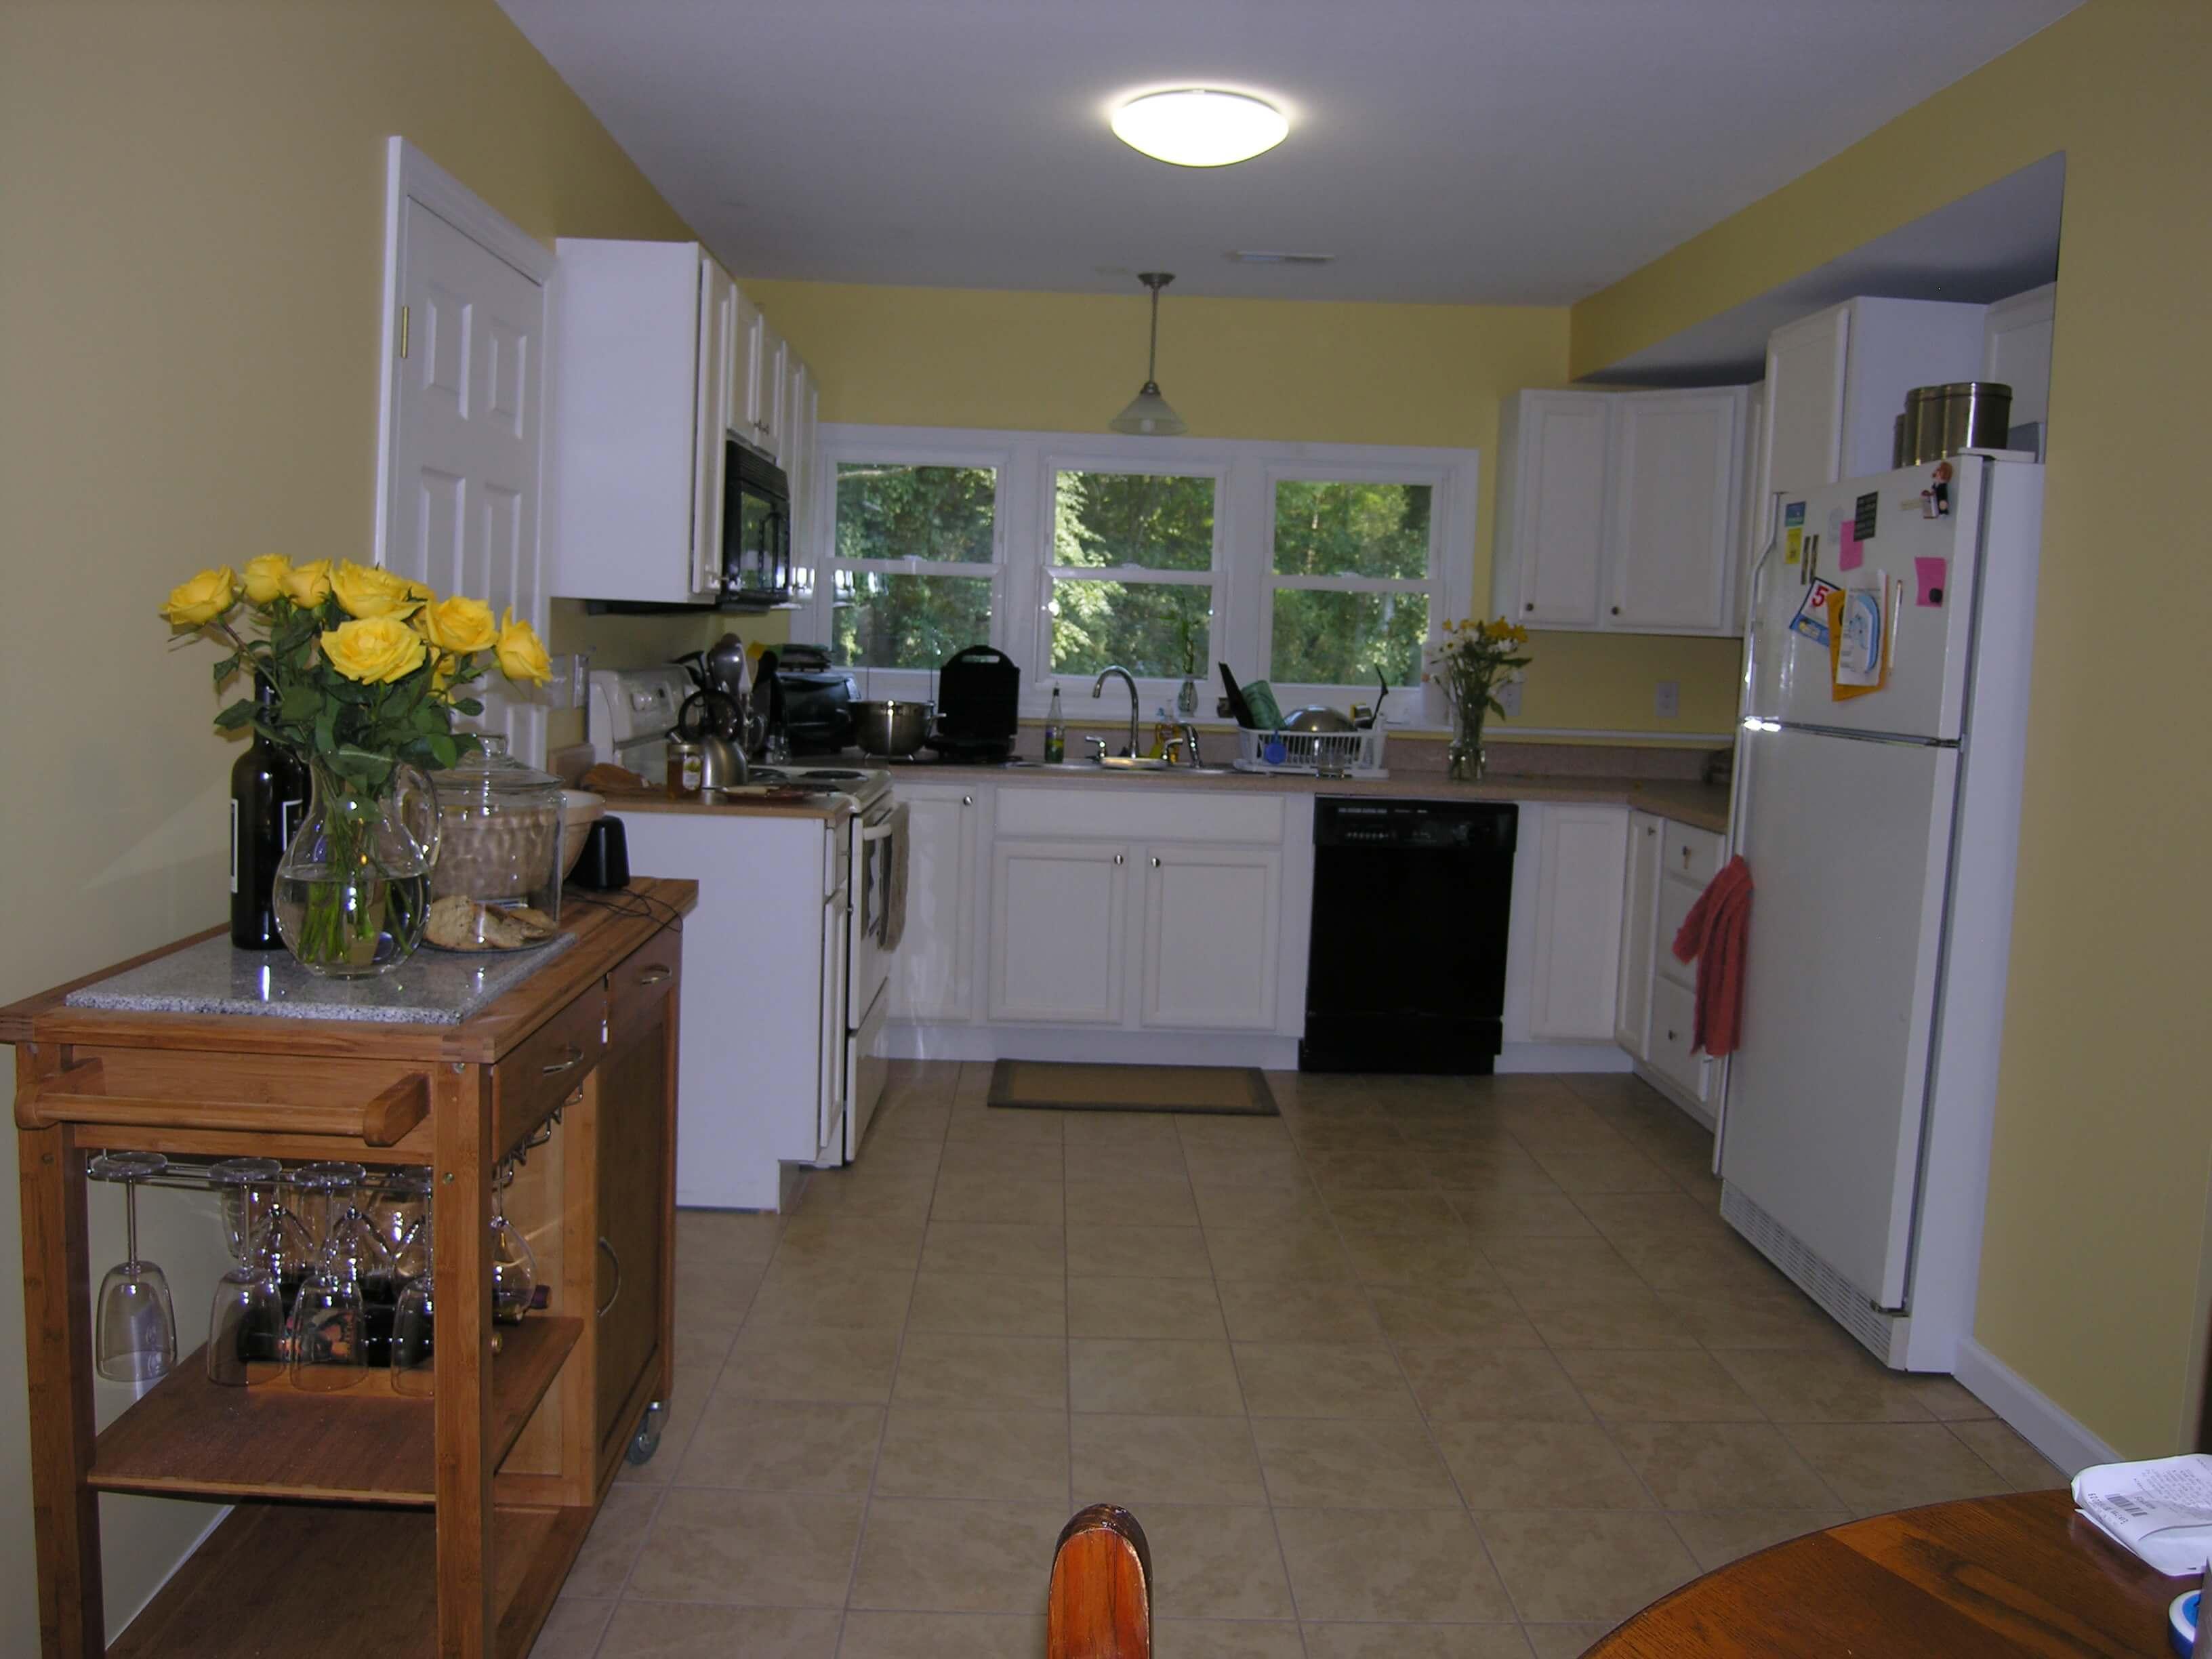 rental house appreciation - Kitchen - after